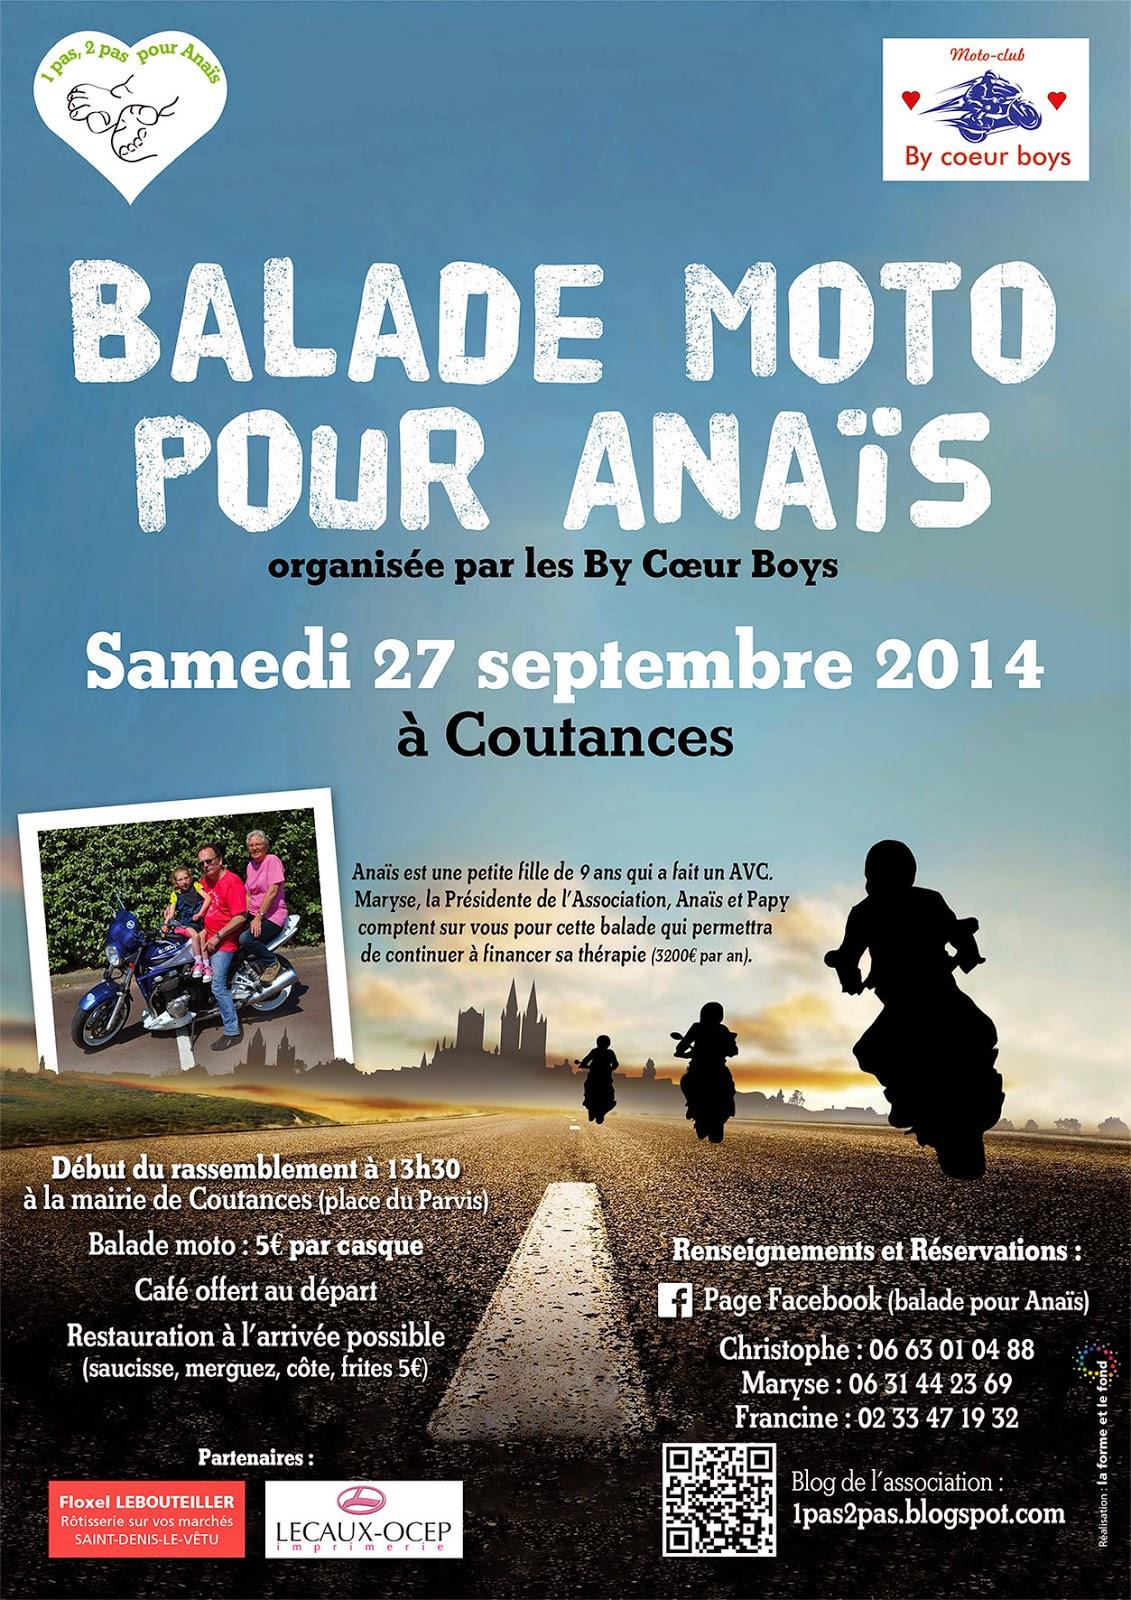 1 Pas 2 Pas Pour Anais Prochain Rendez Vous Balade A Moto